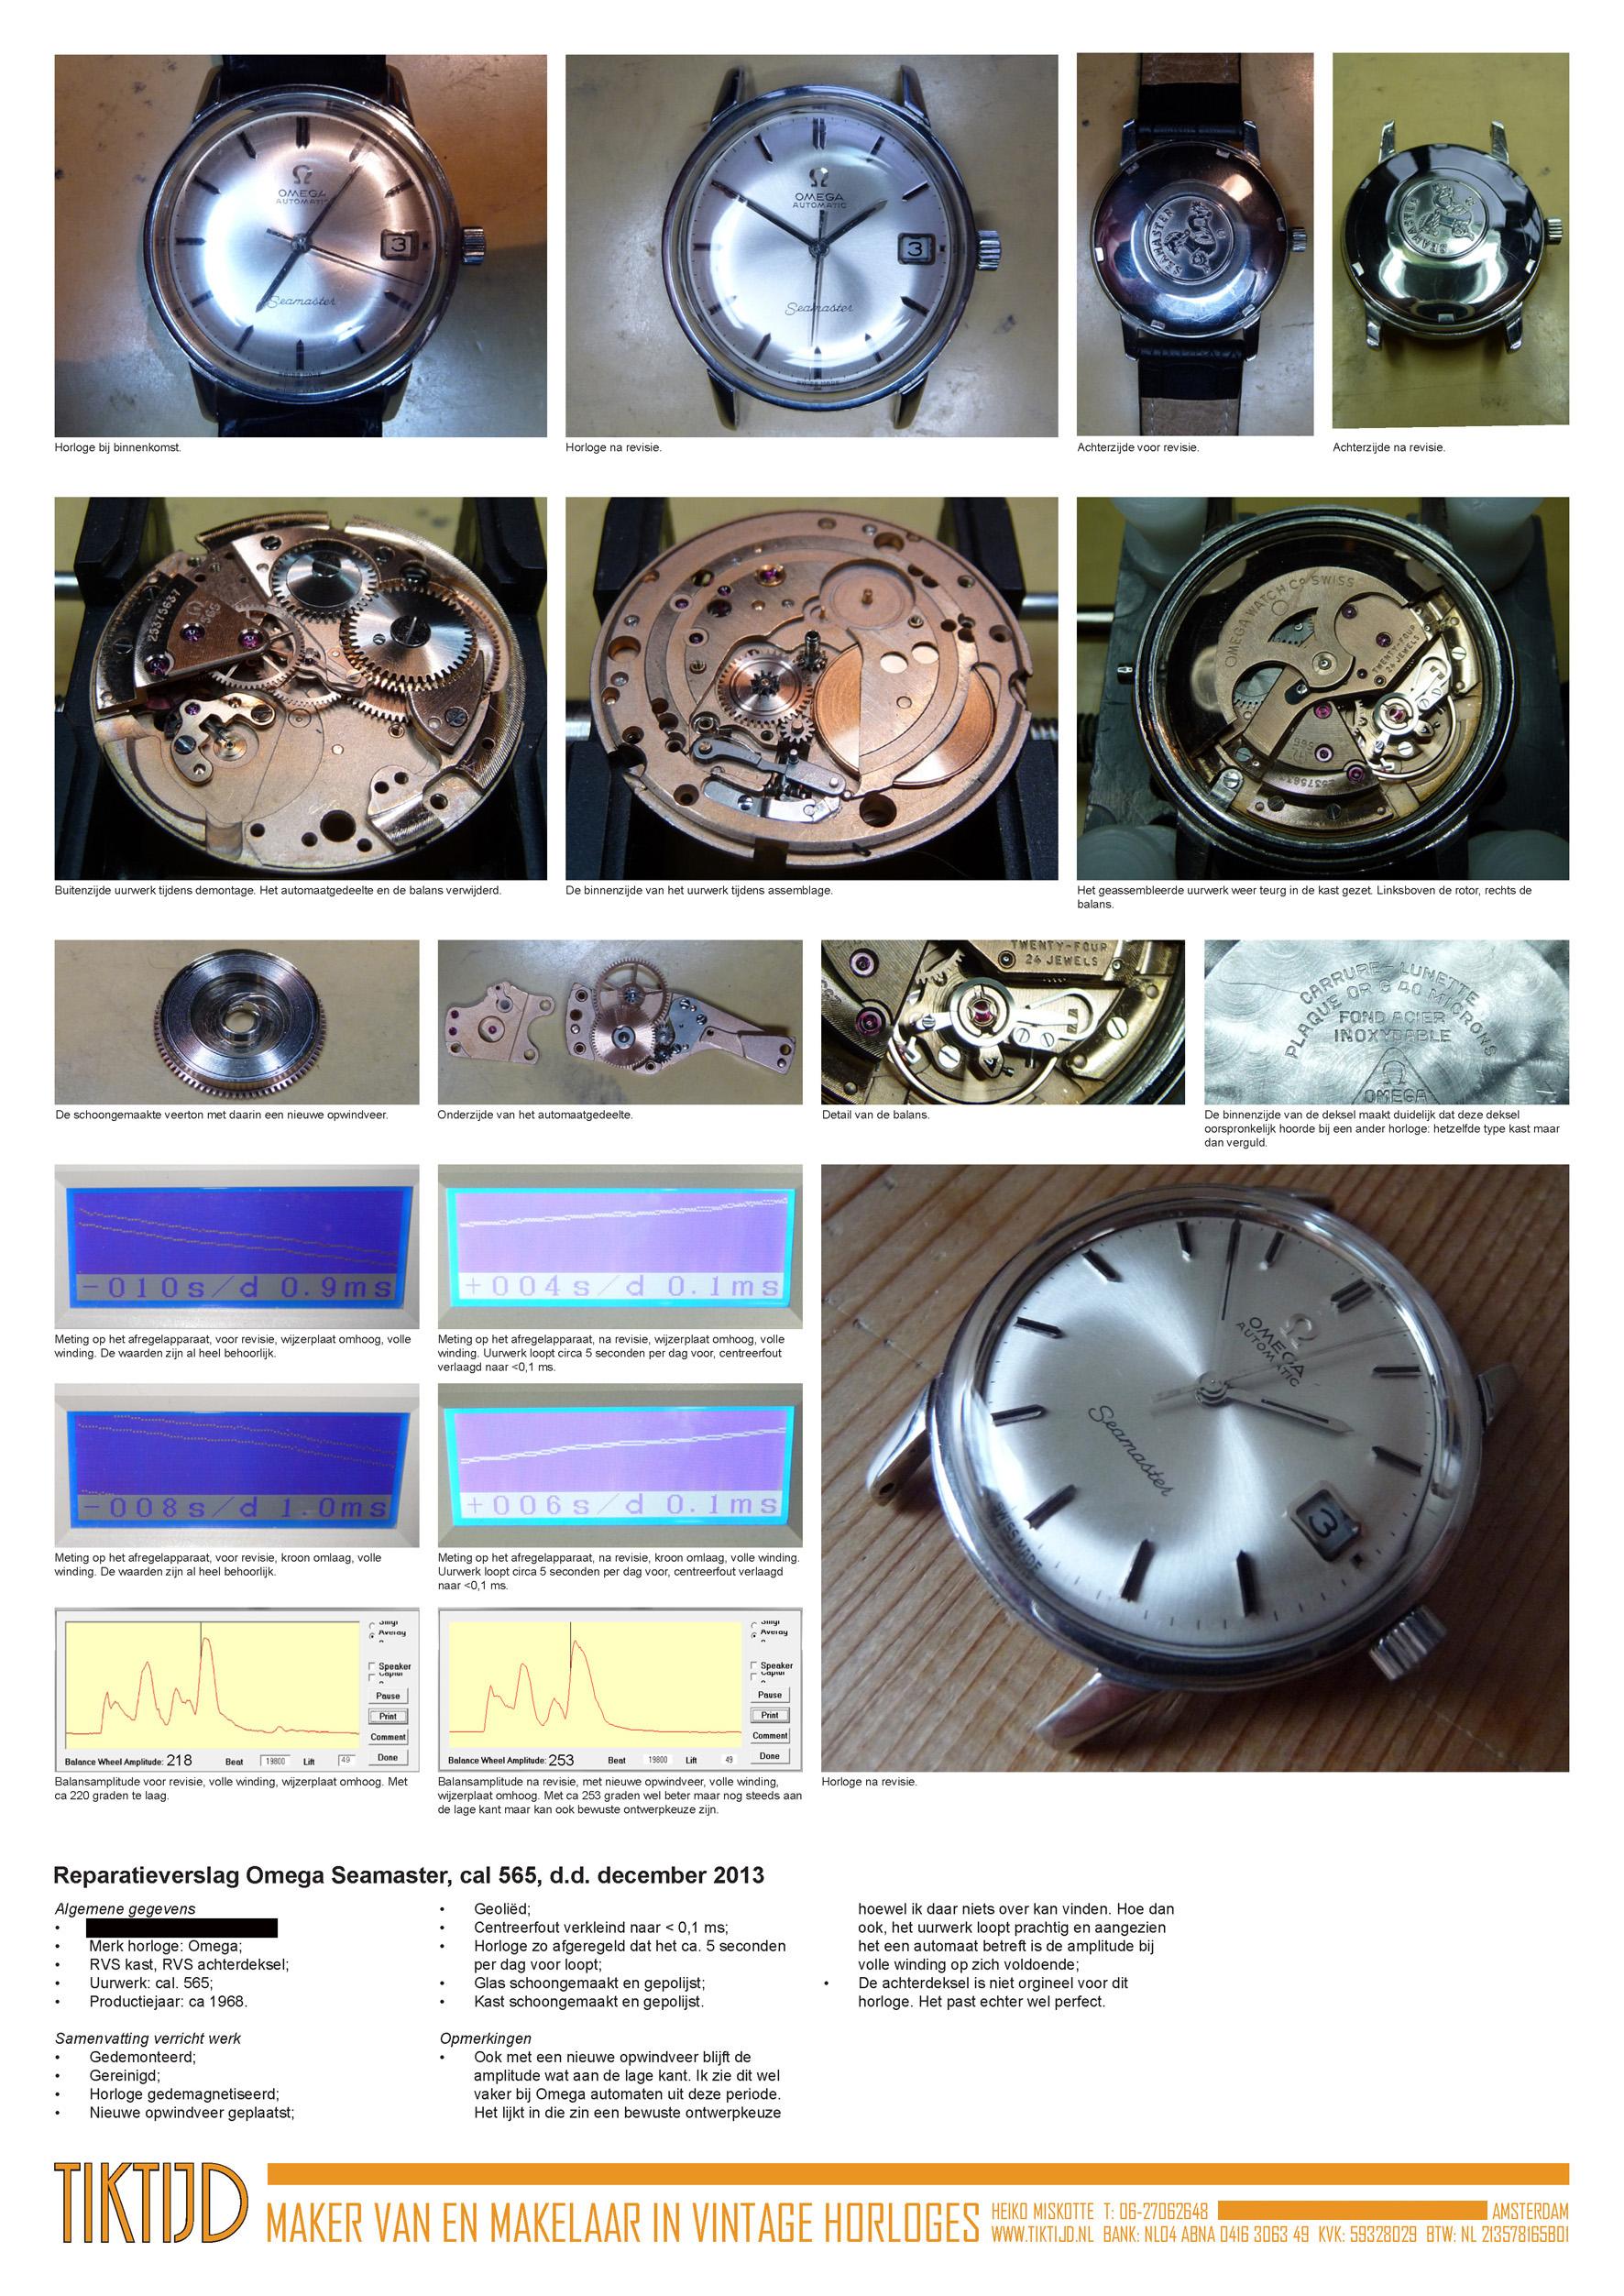 Reparatieverslag_Omega Seamaster cal 565_december 2013b